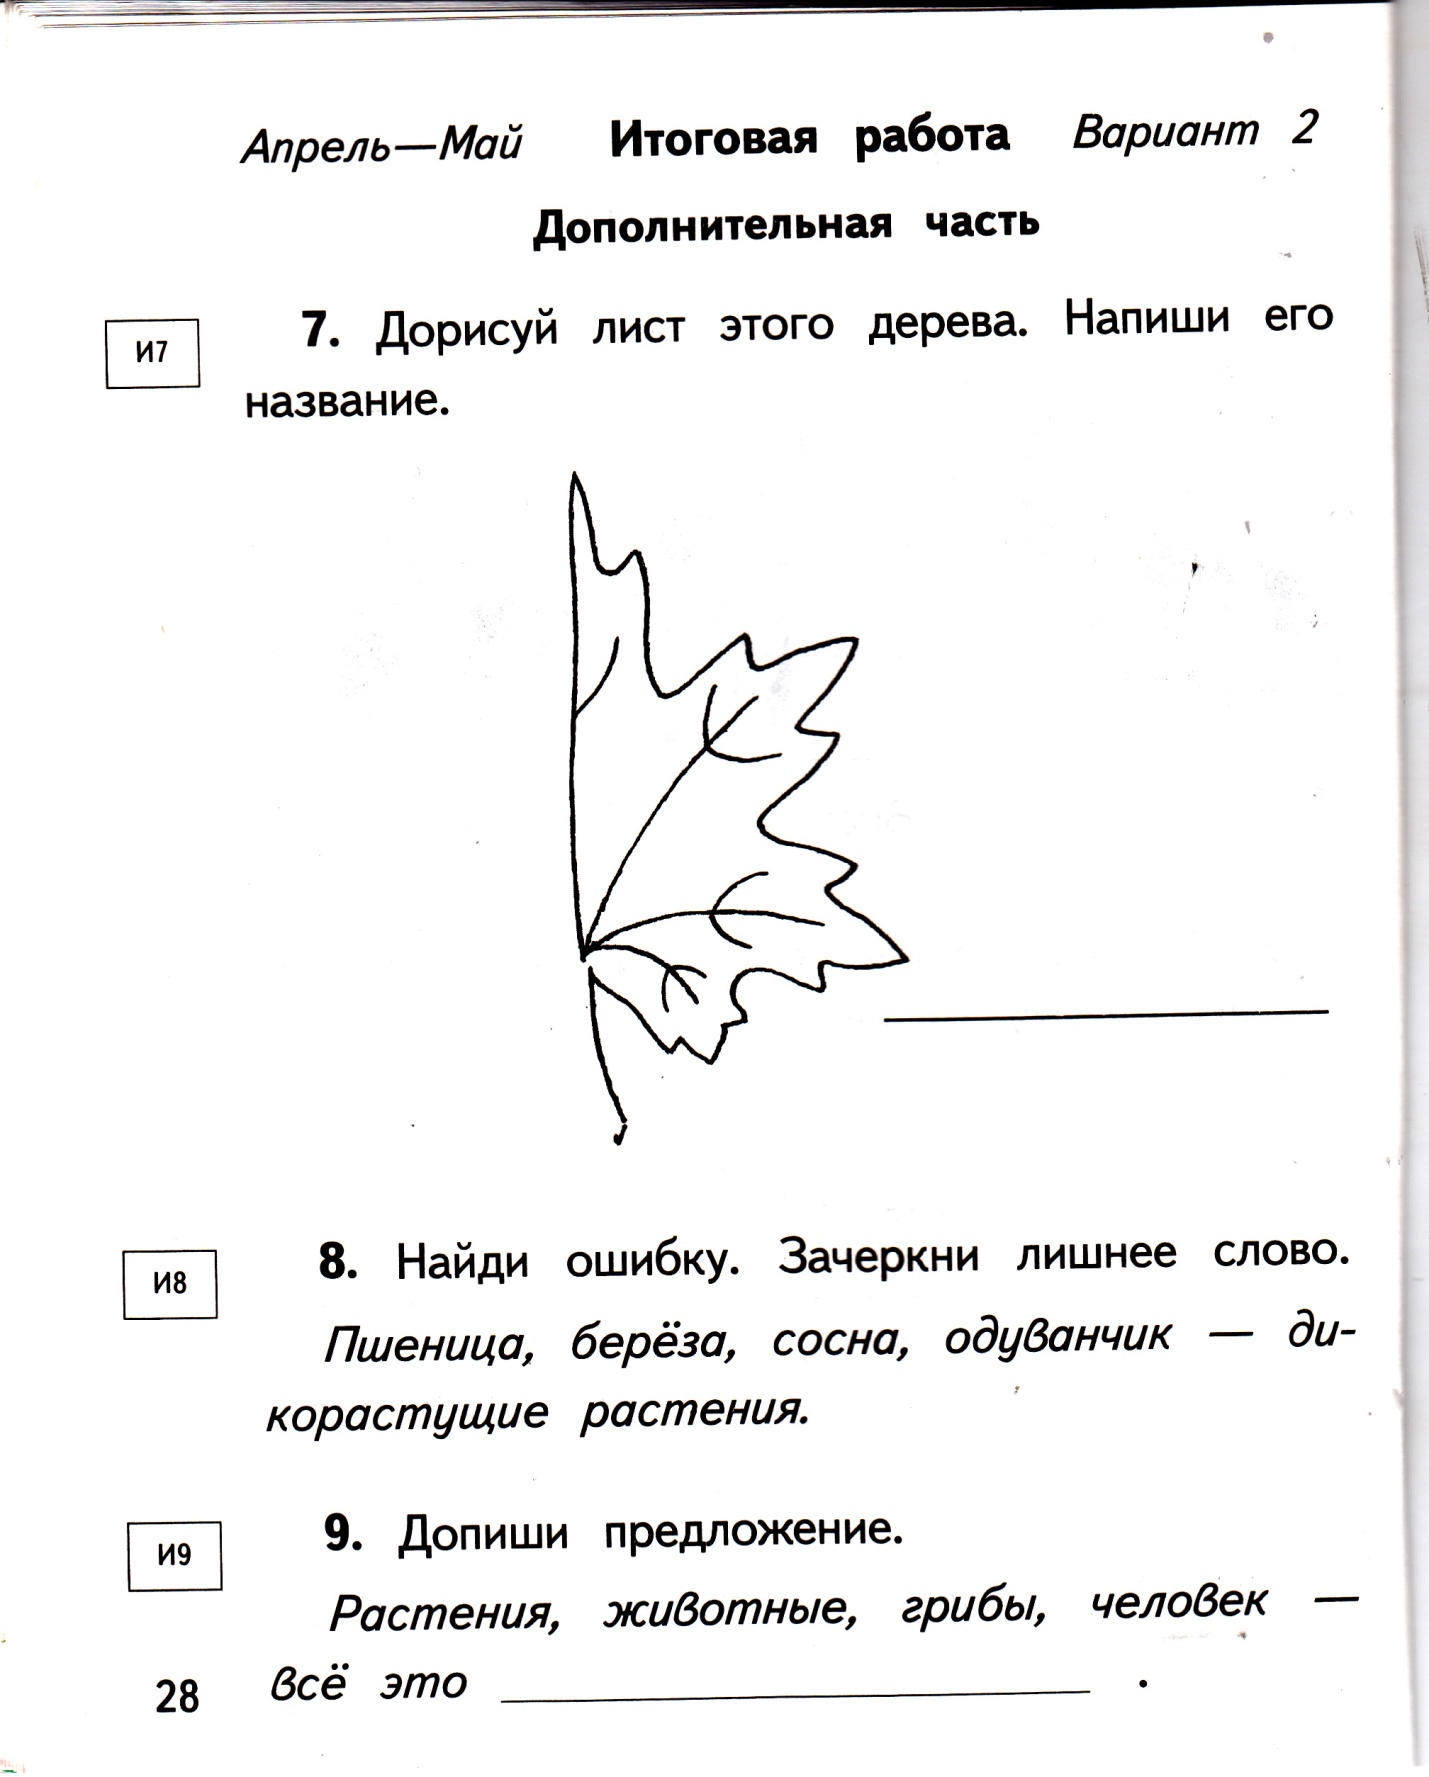 C:\Users\МБОУ СОШ № 4\Desktop\для Жуковой С.Н\IMG_0038.jpg